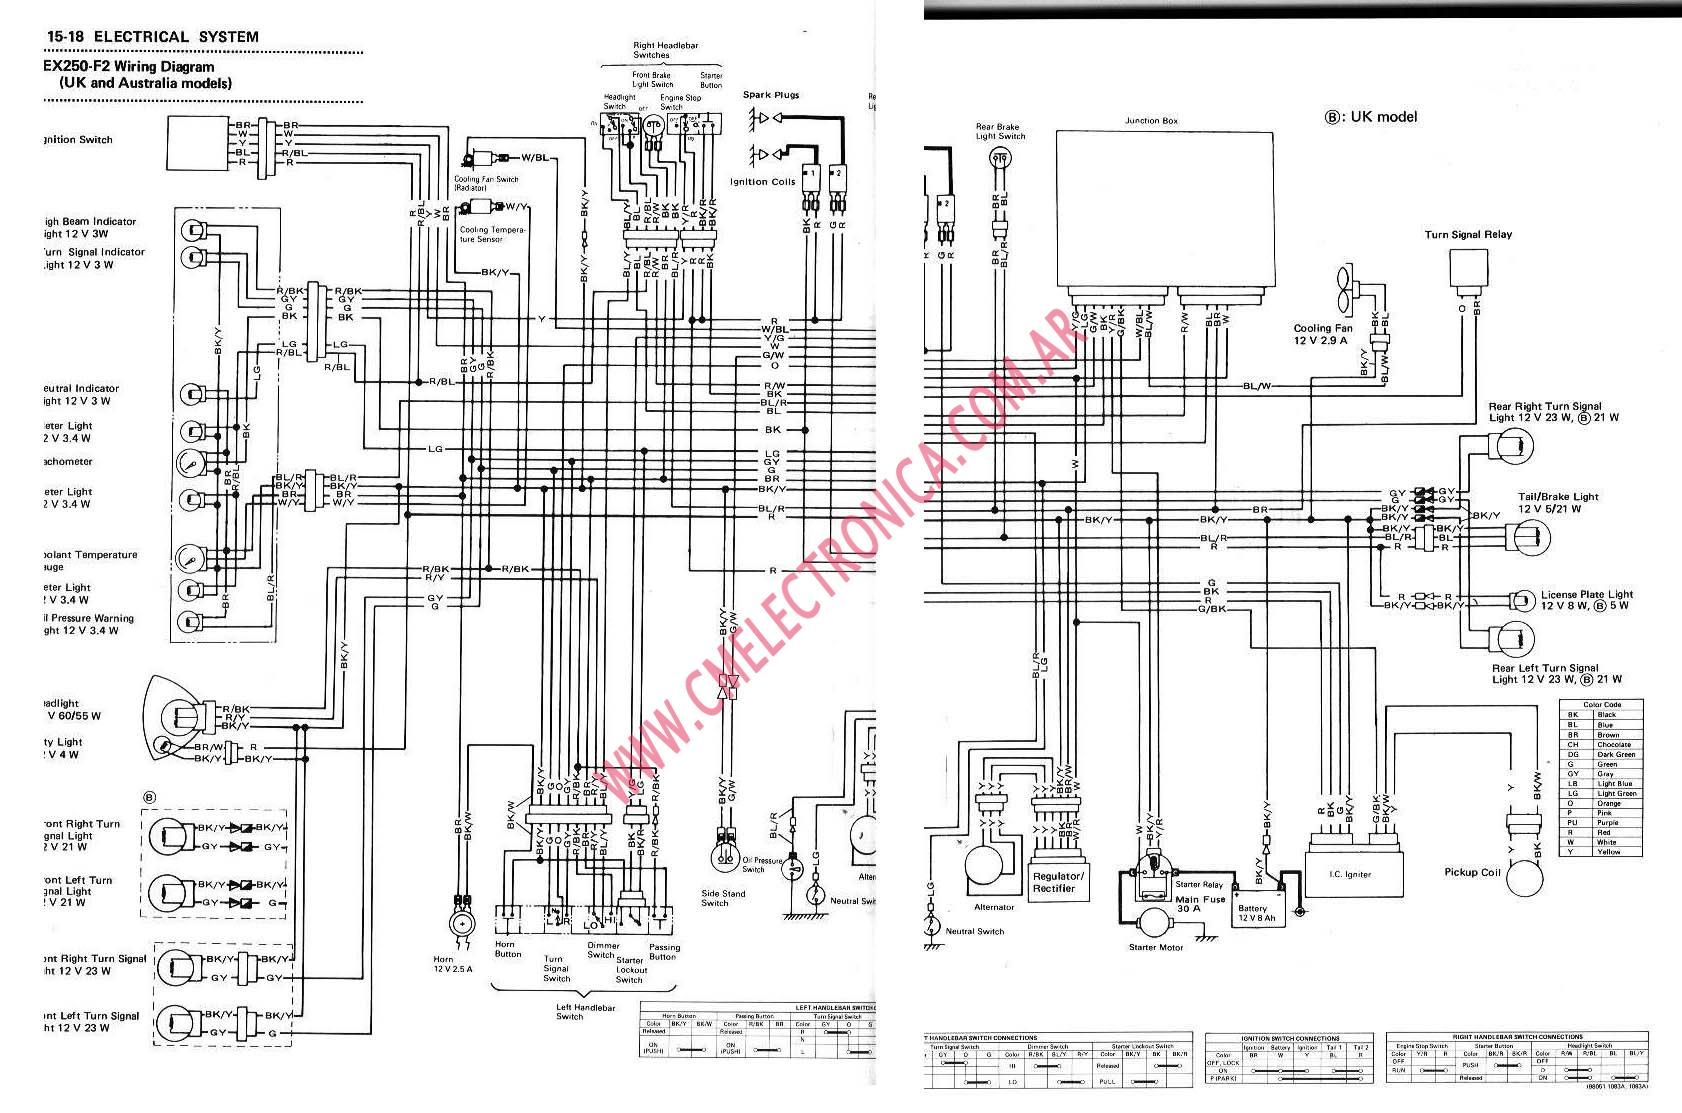 99 Tahoe Fuse Box Inside Auto Electrical Wiring Diagram Venture Jaguar Xj8